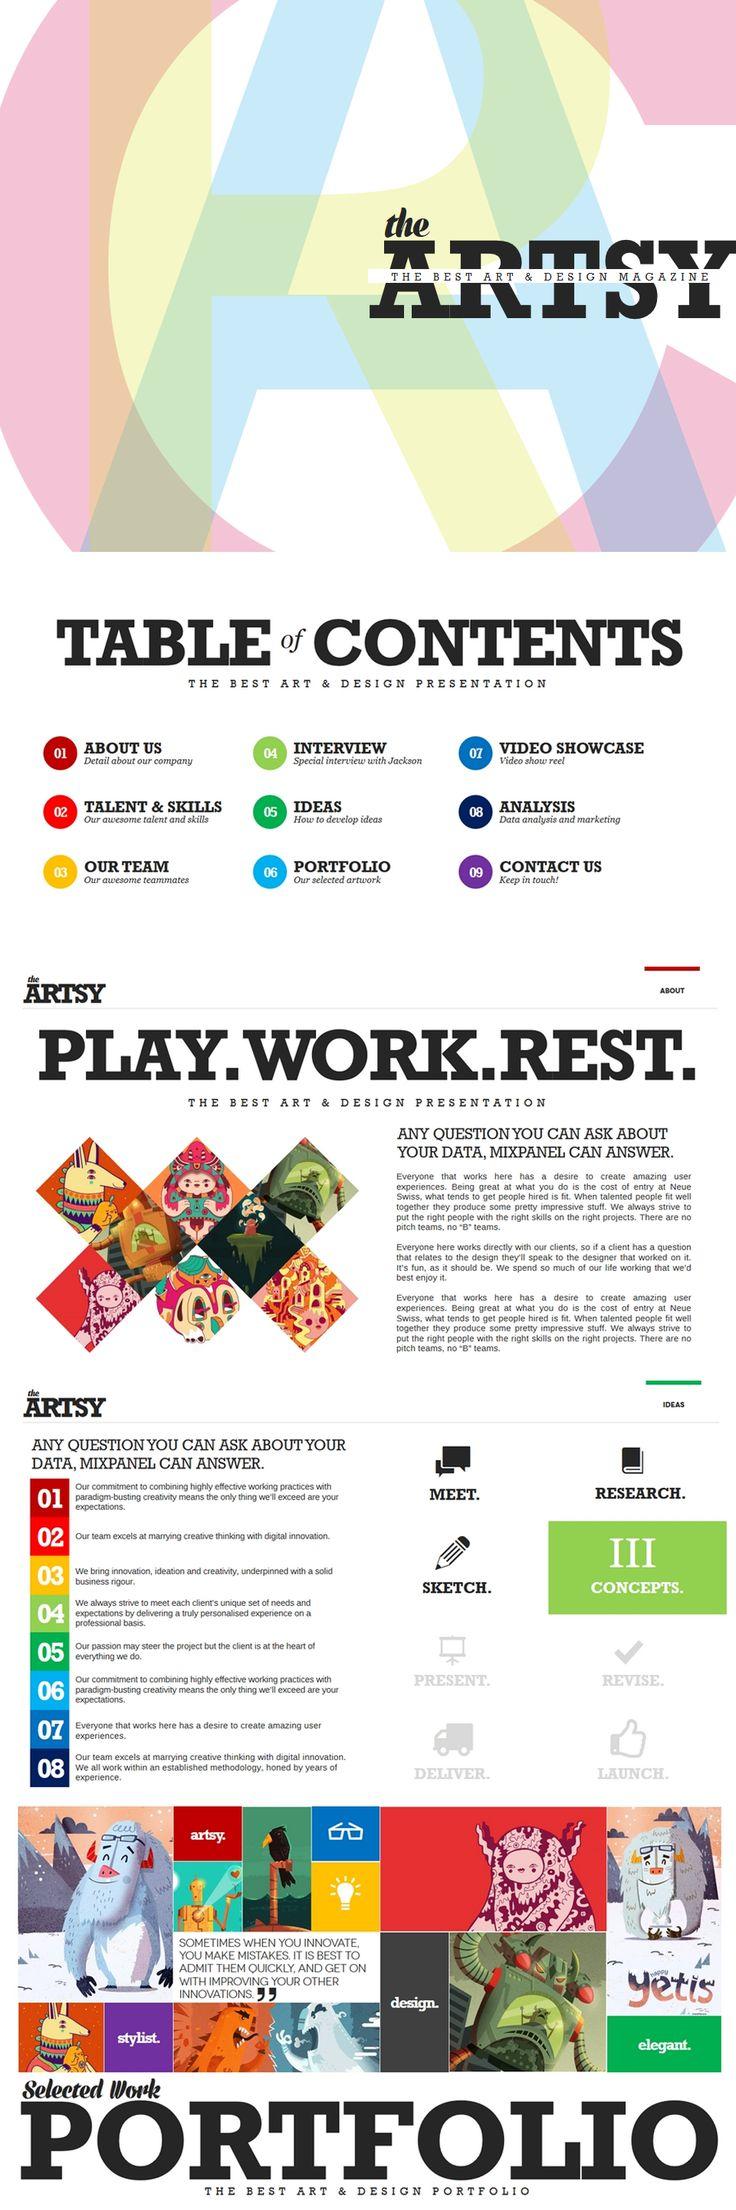 46 best presentations images on pinterest presentation layout artsy magazine powerpoint template toneelgroepblik Image collections